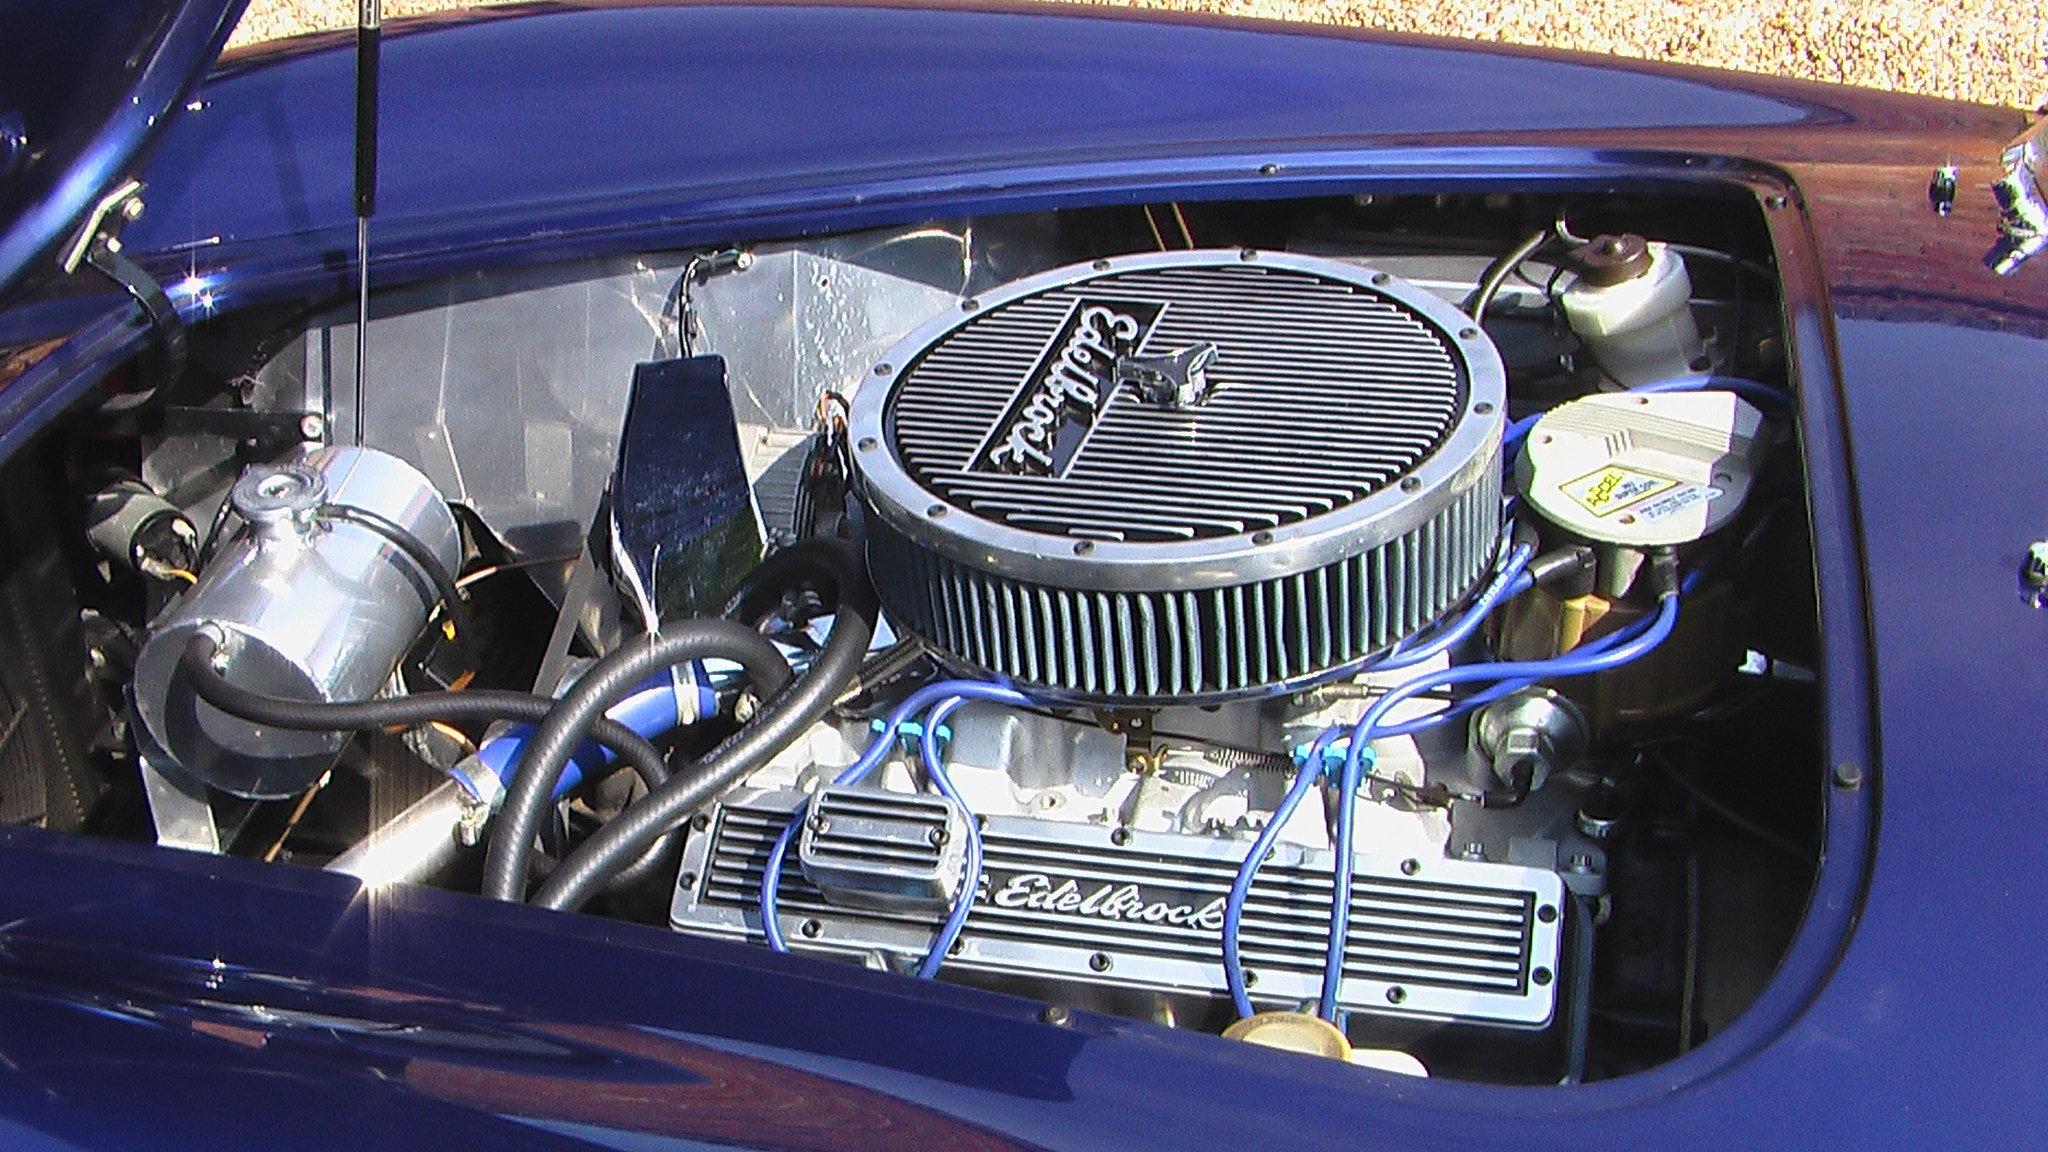 1998 6.5L CHEVY V8, DAX TOJEIRO COBRA For Sale (picture 6 of 6)